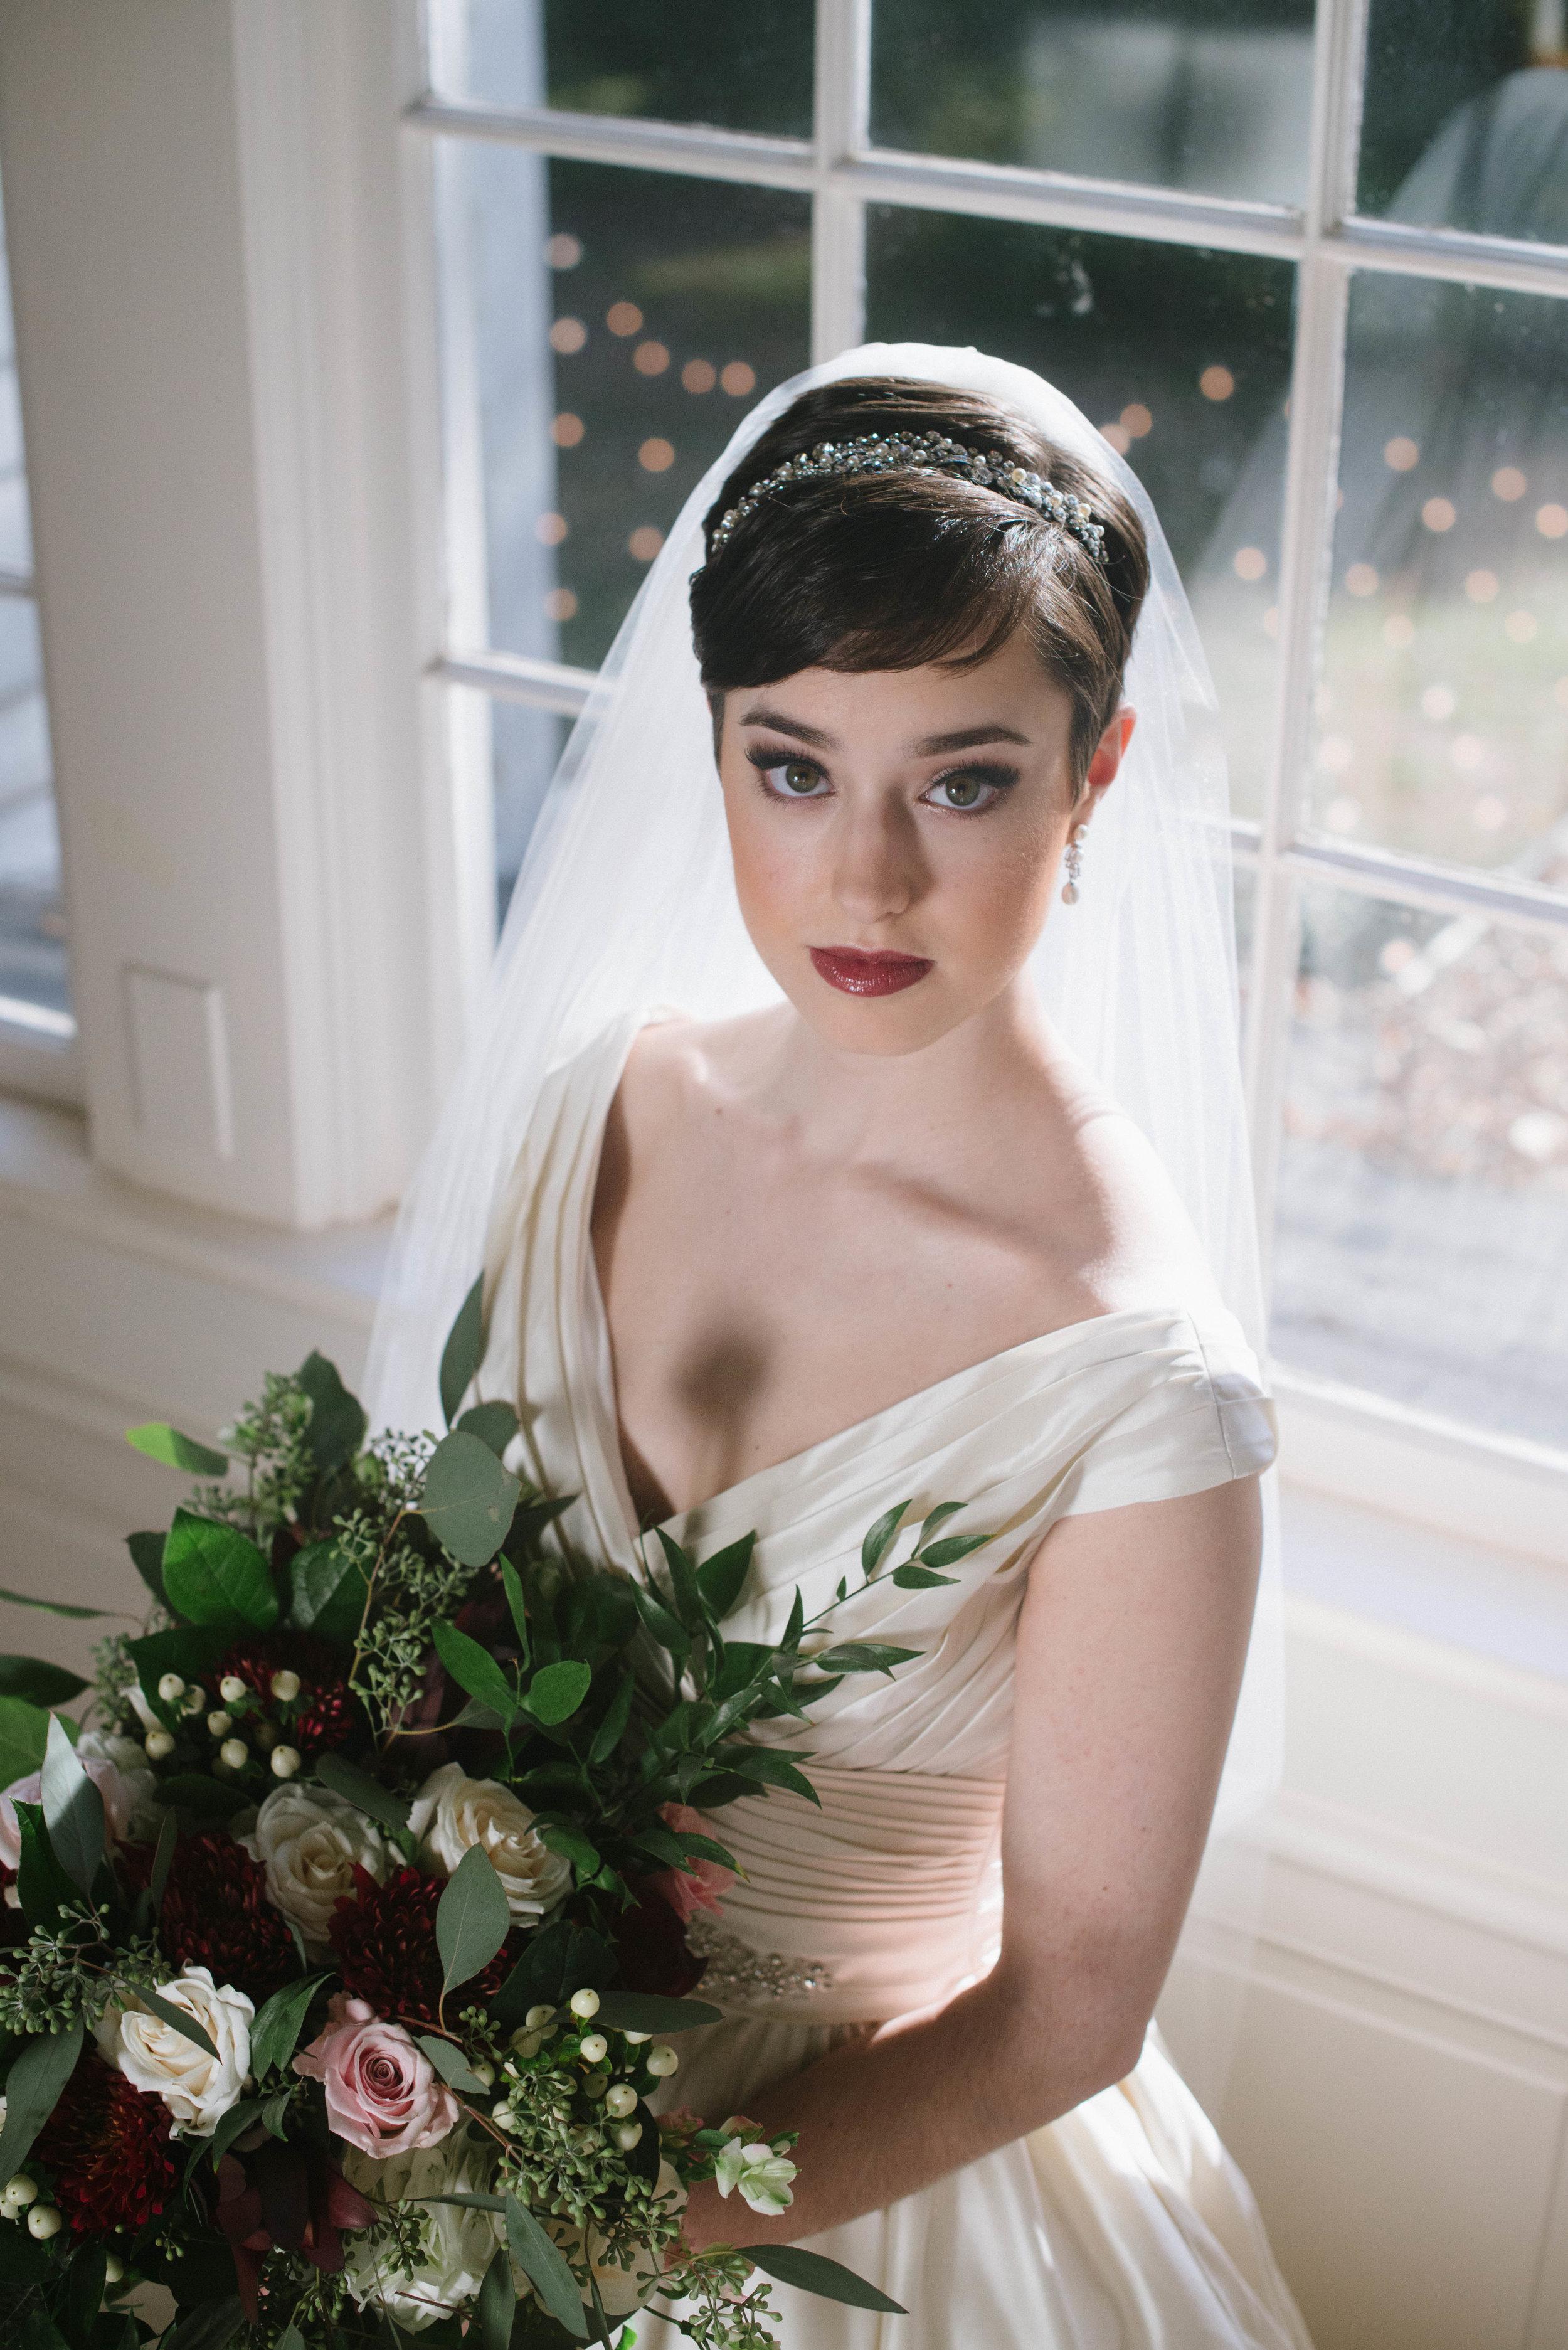 CarolineMerritt|Bridals|_Color_MiraPhotographs-29.jpg